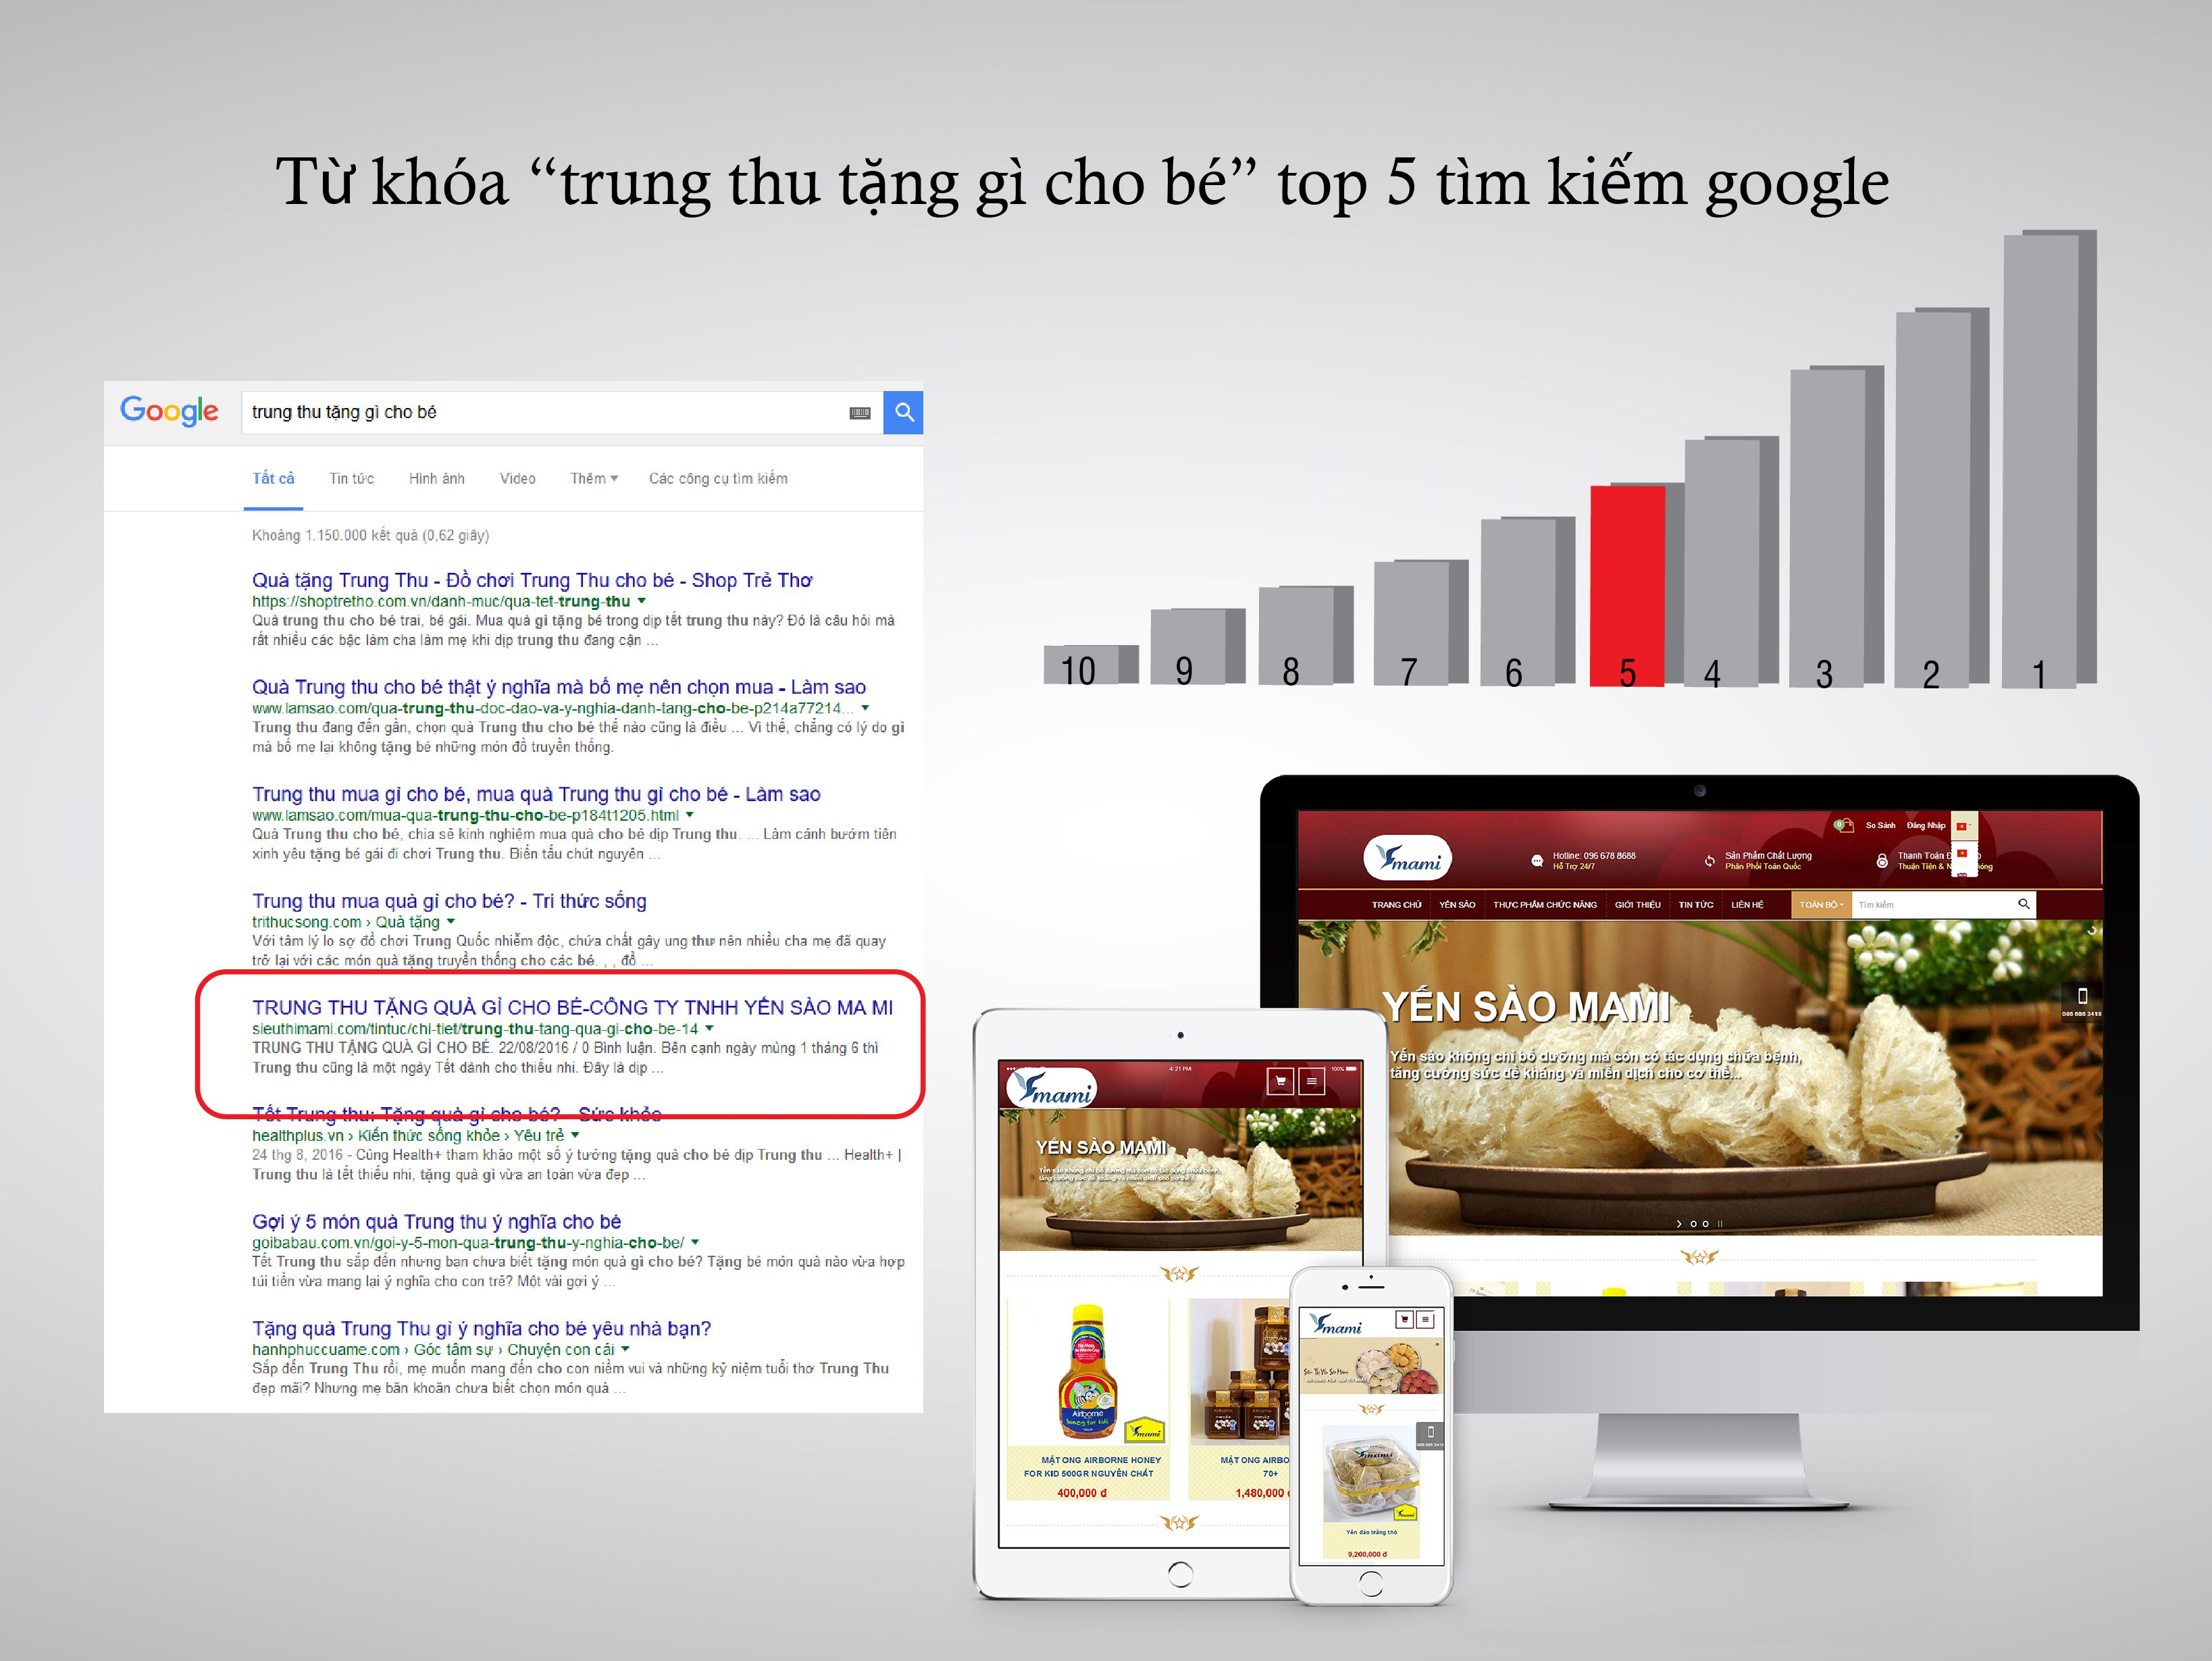 SEO cho website bán hàng sieuthimami.com